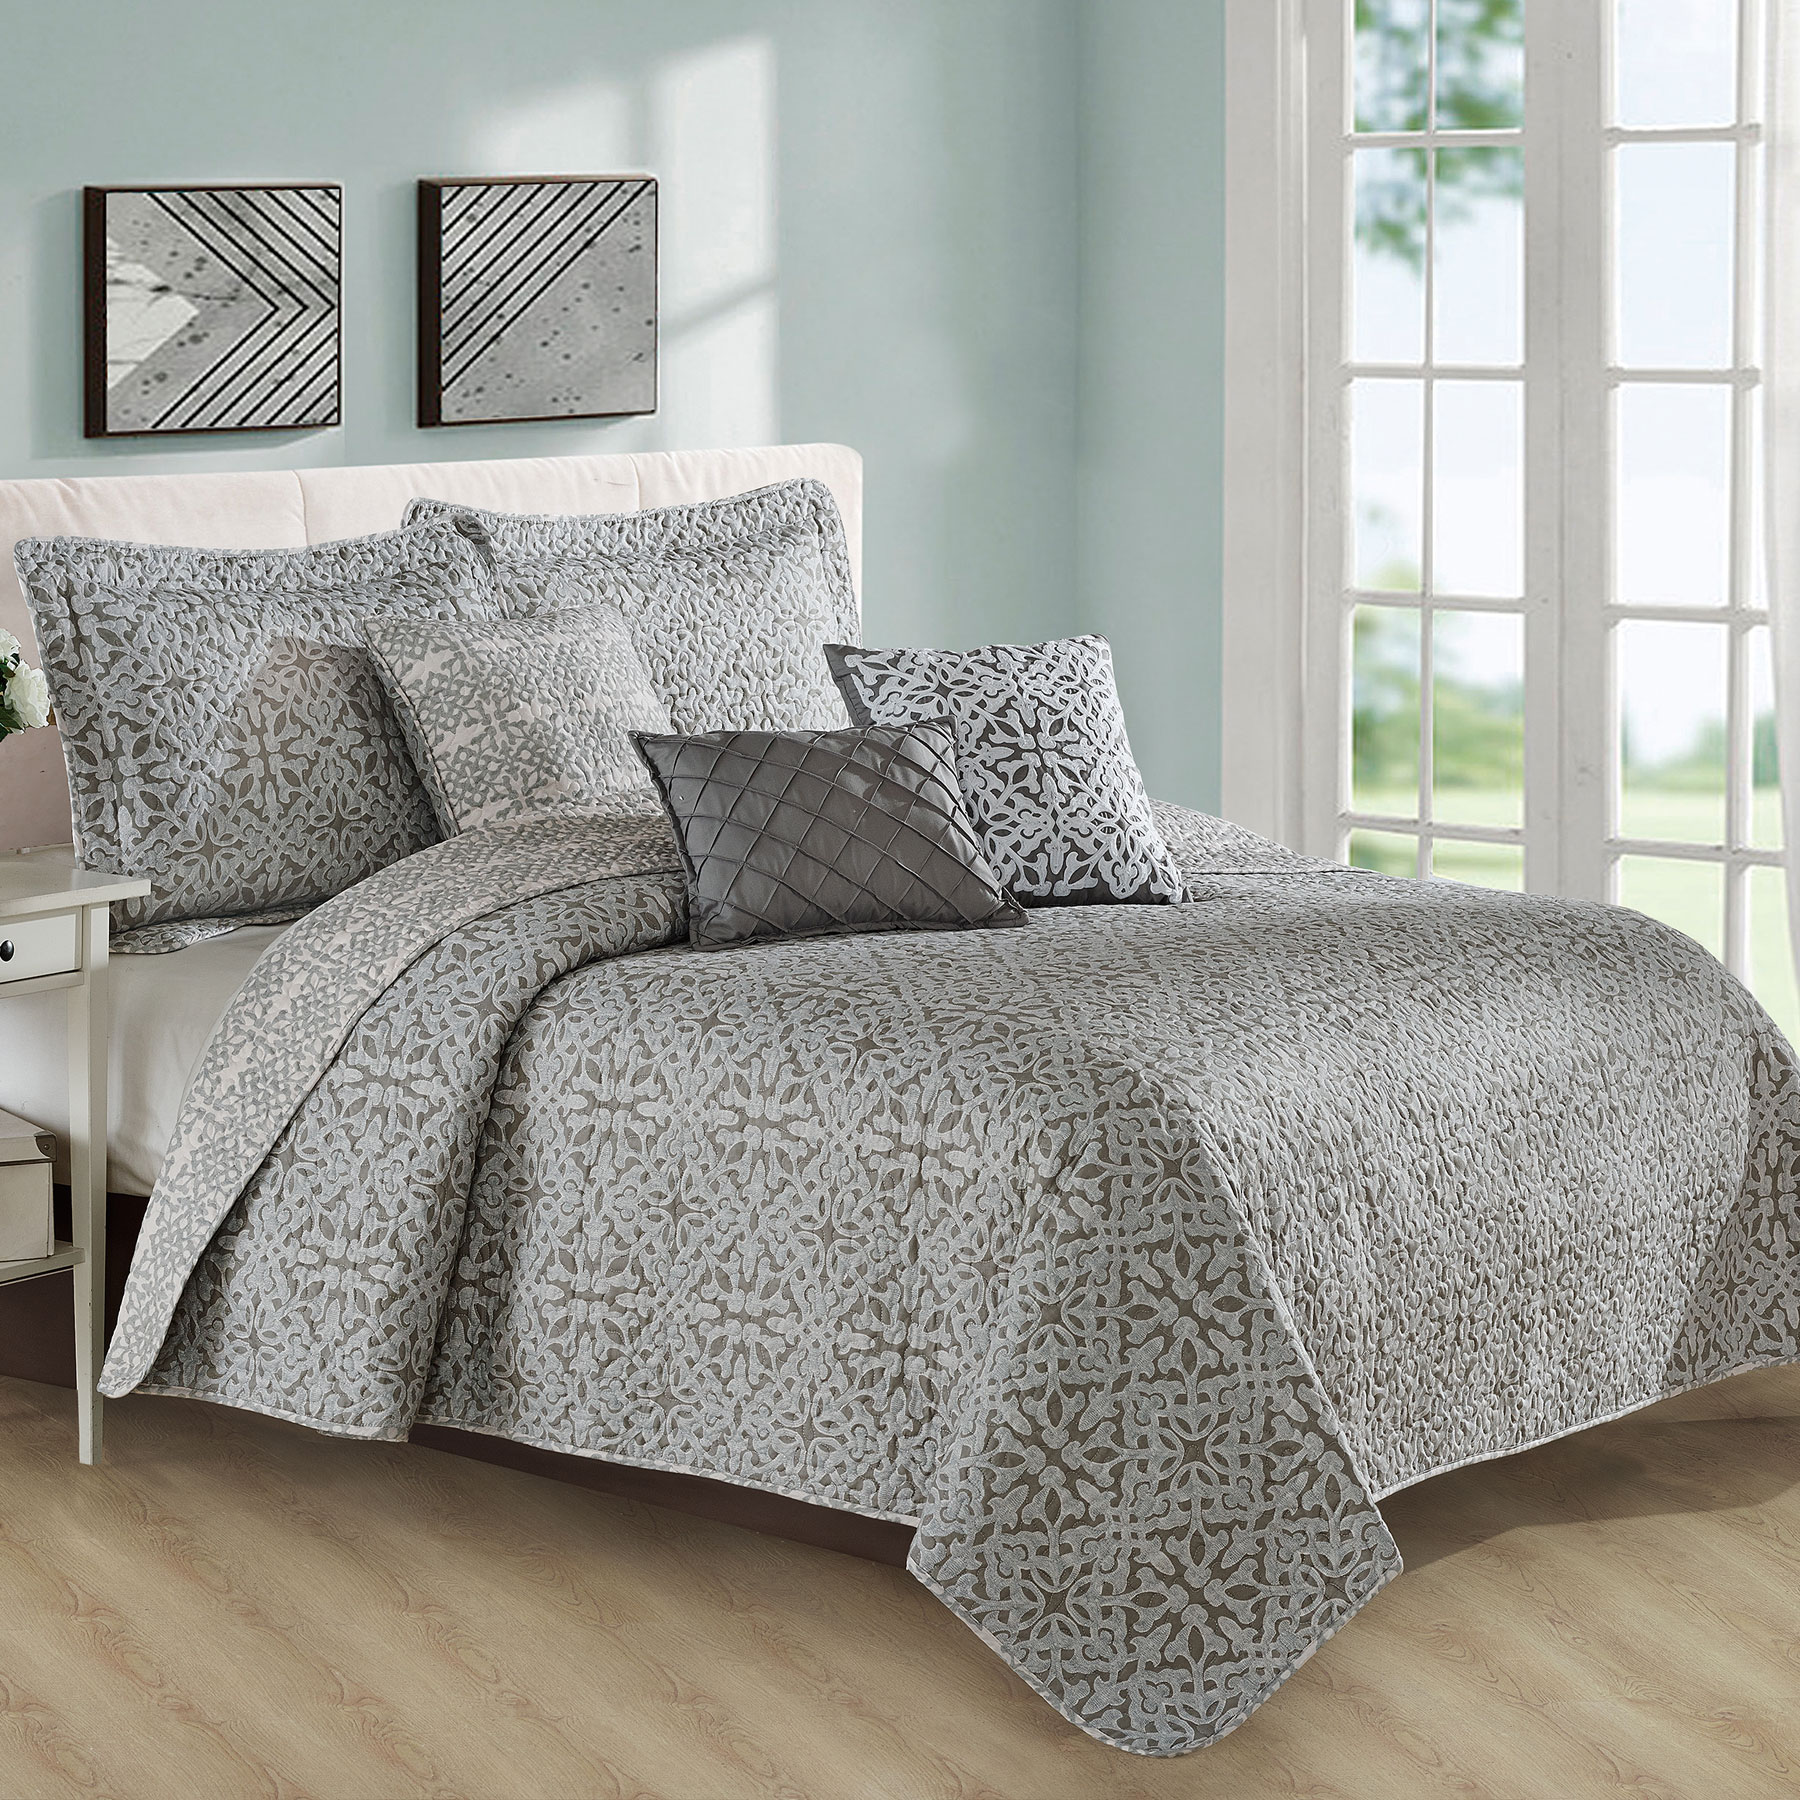 Serenta Bellamy Printed Quilted 6 Piece Bed Spread Set